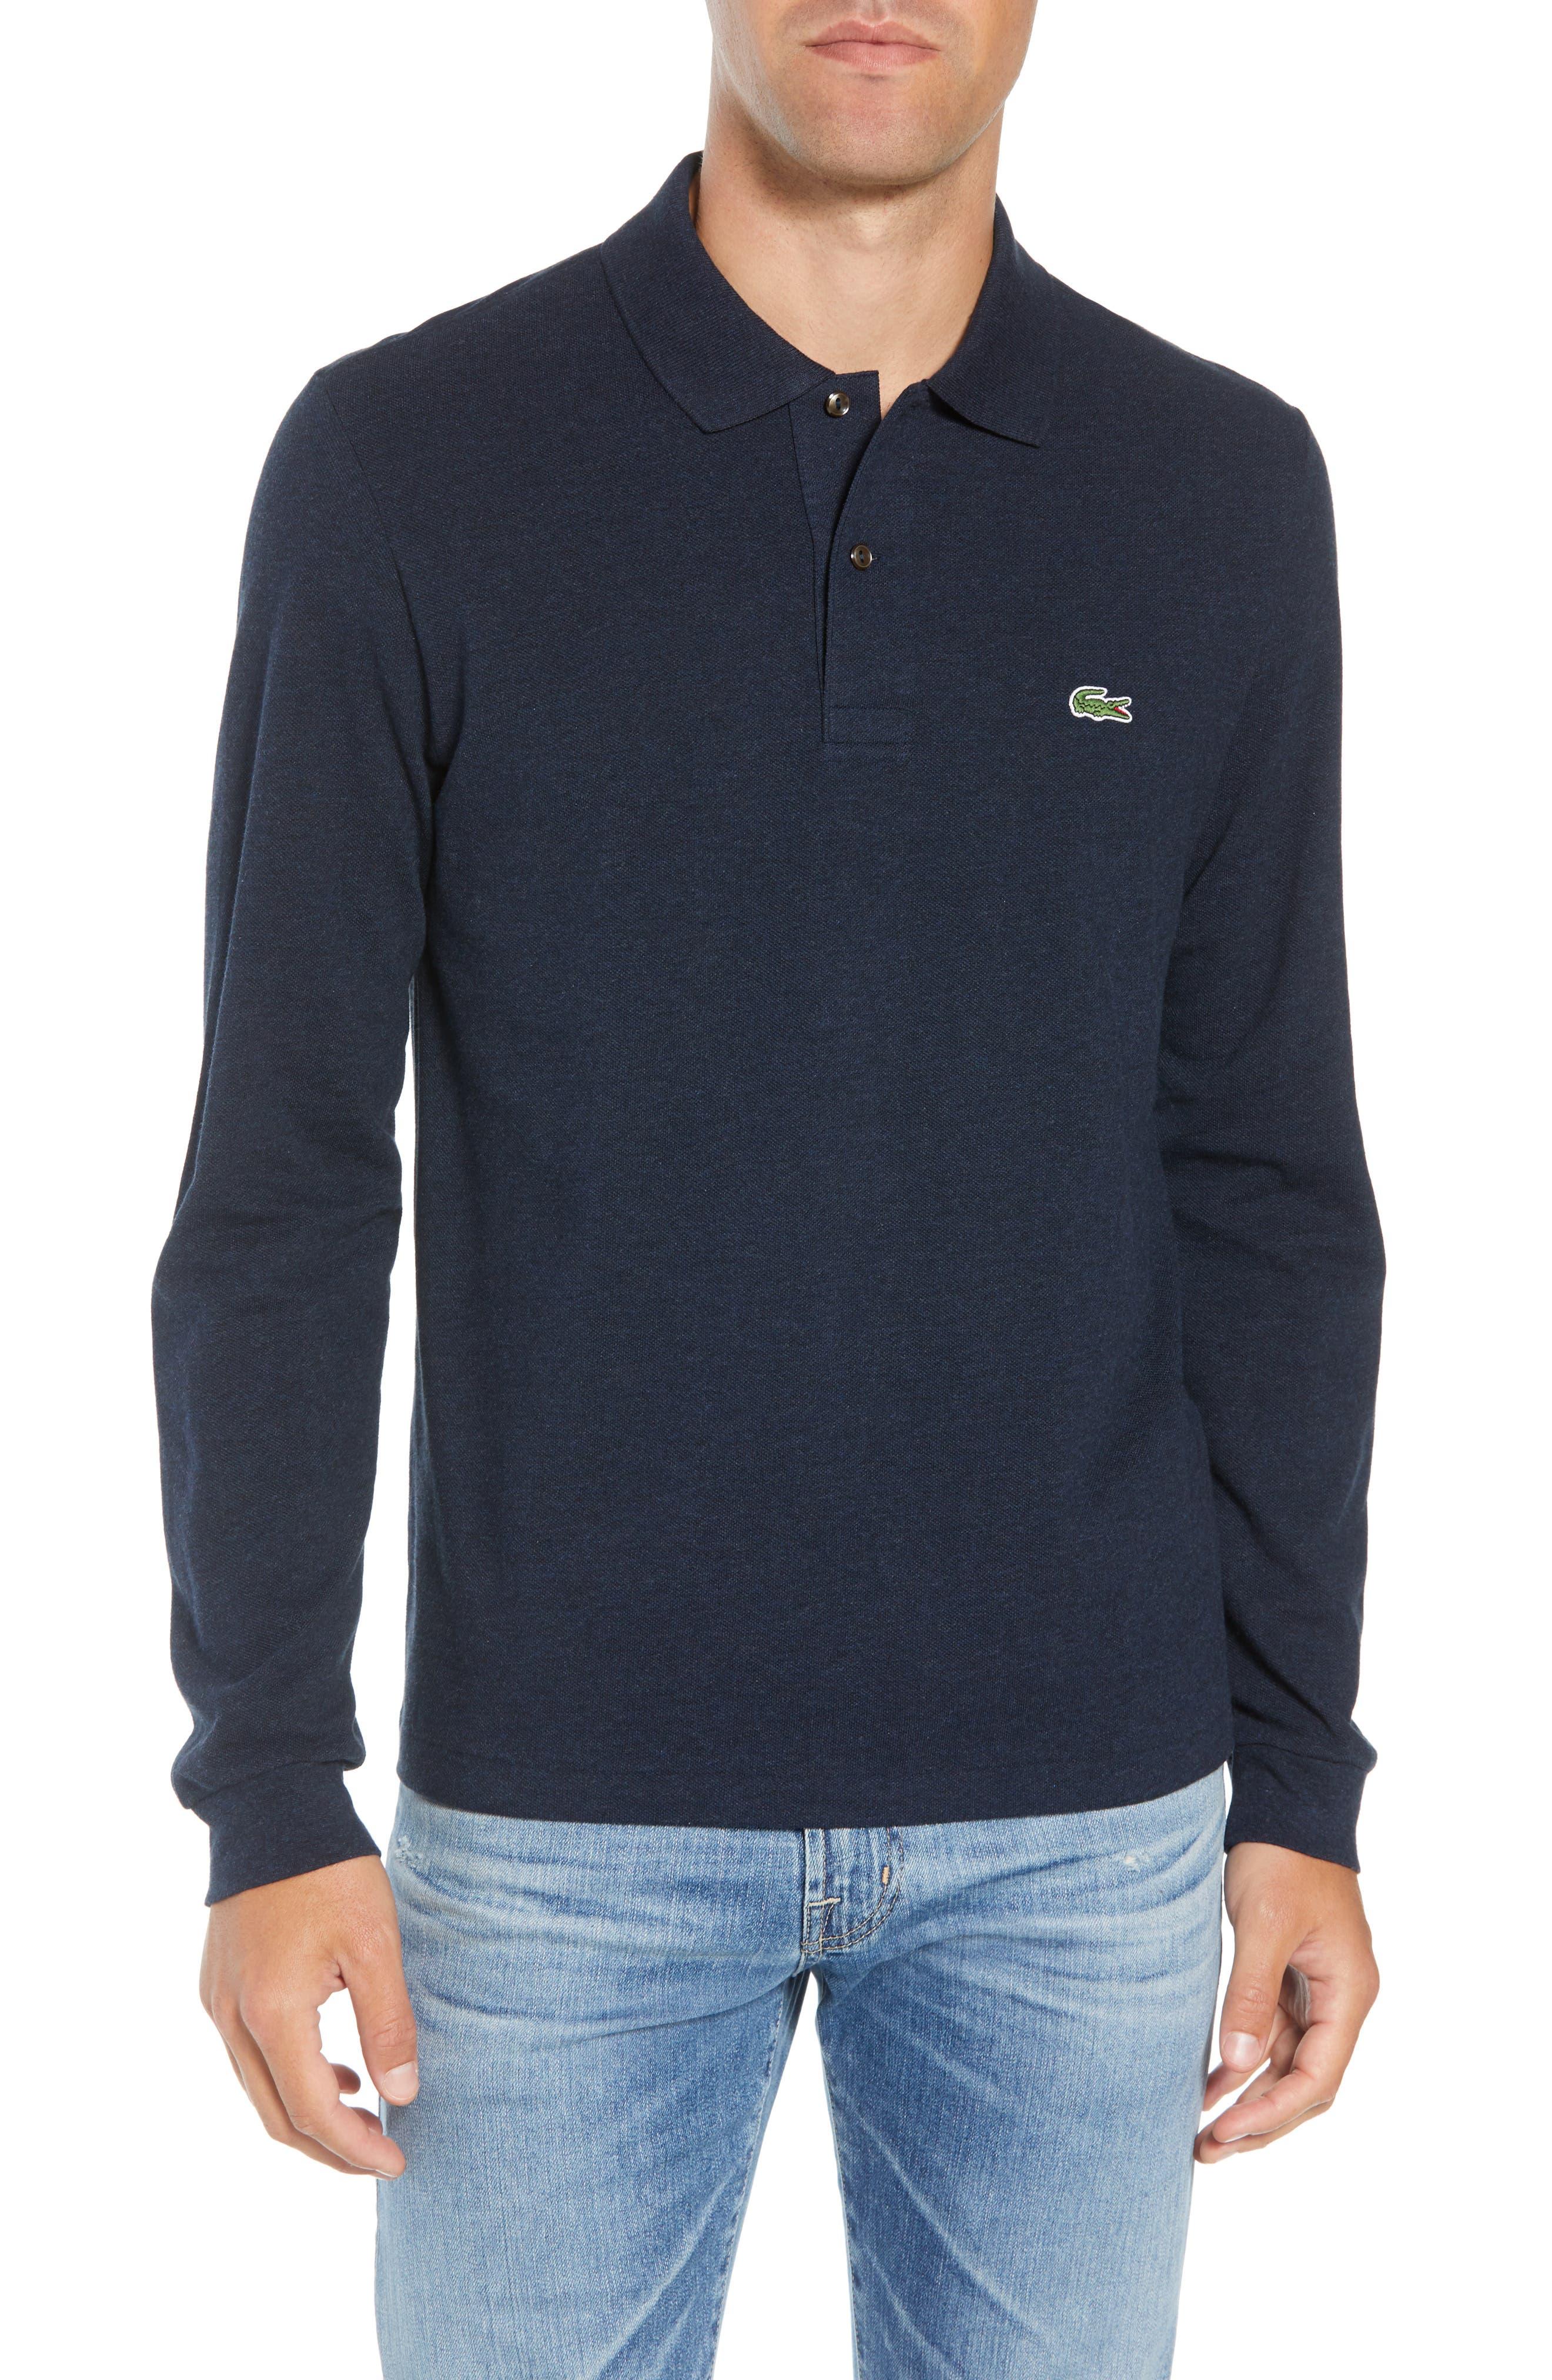 LACOSTE Long Sleeve Piqué Polo, Main, color, ECLIPSE BLUE CHINE